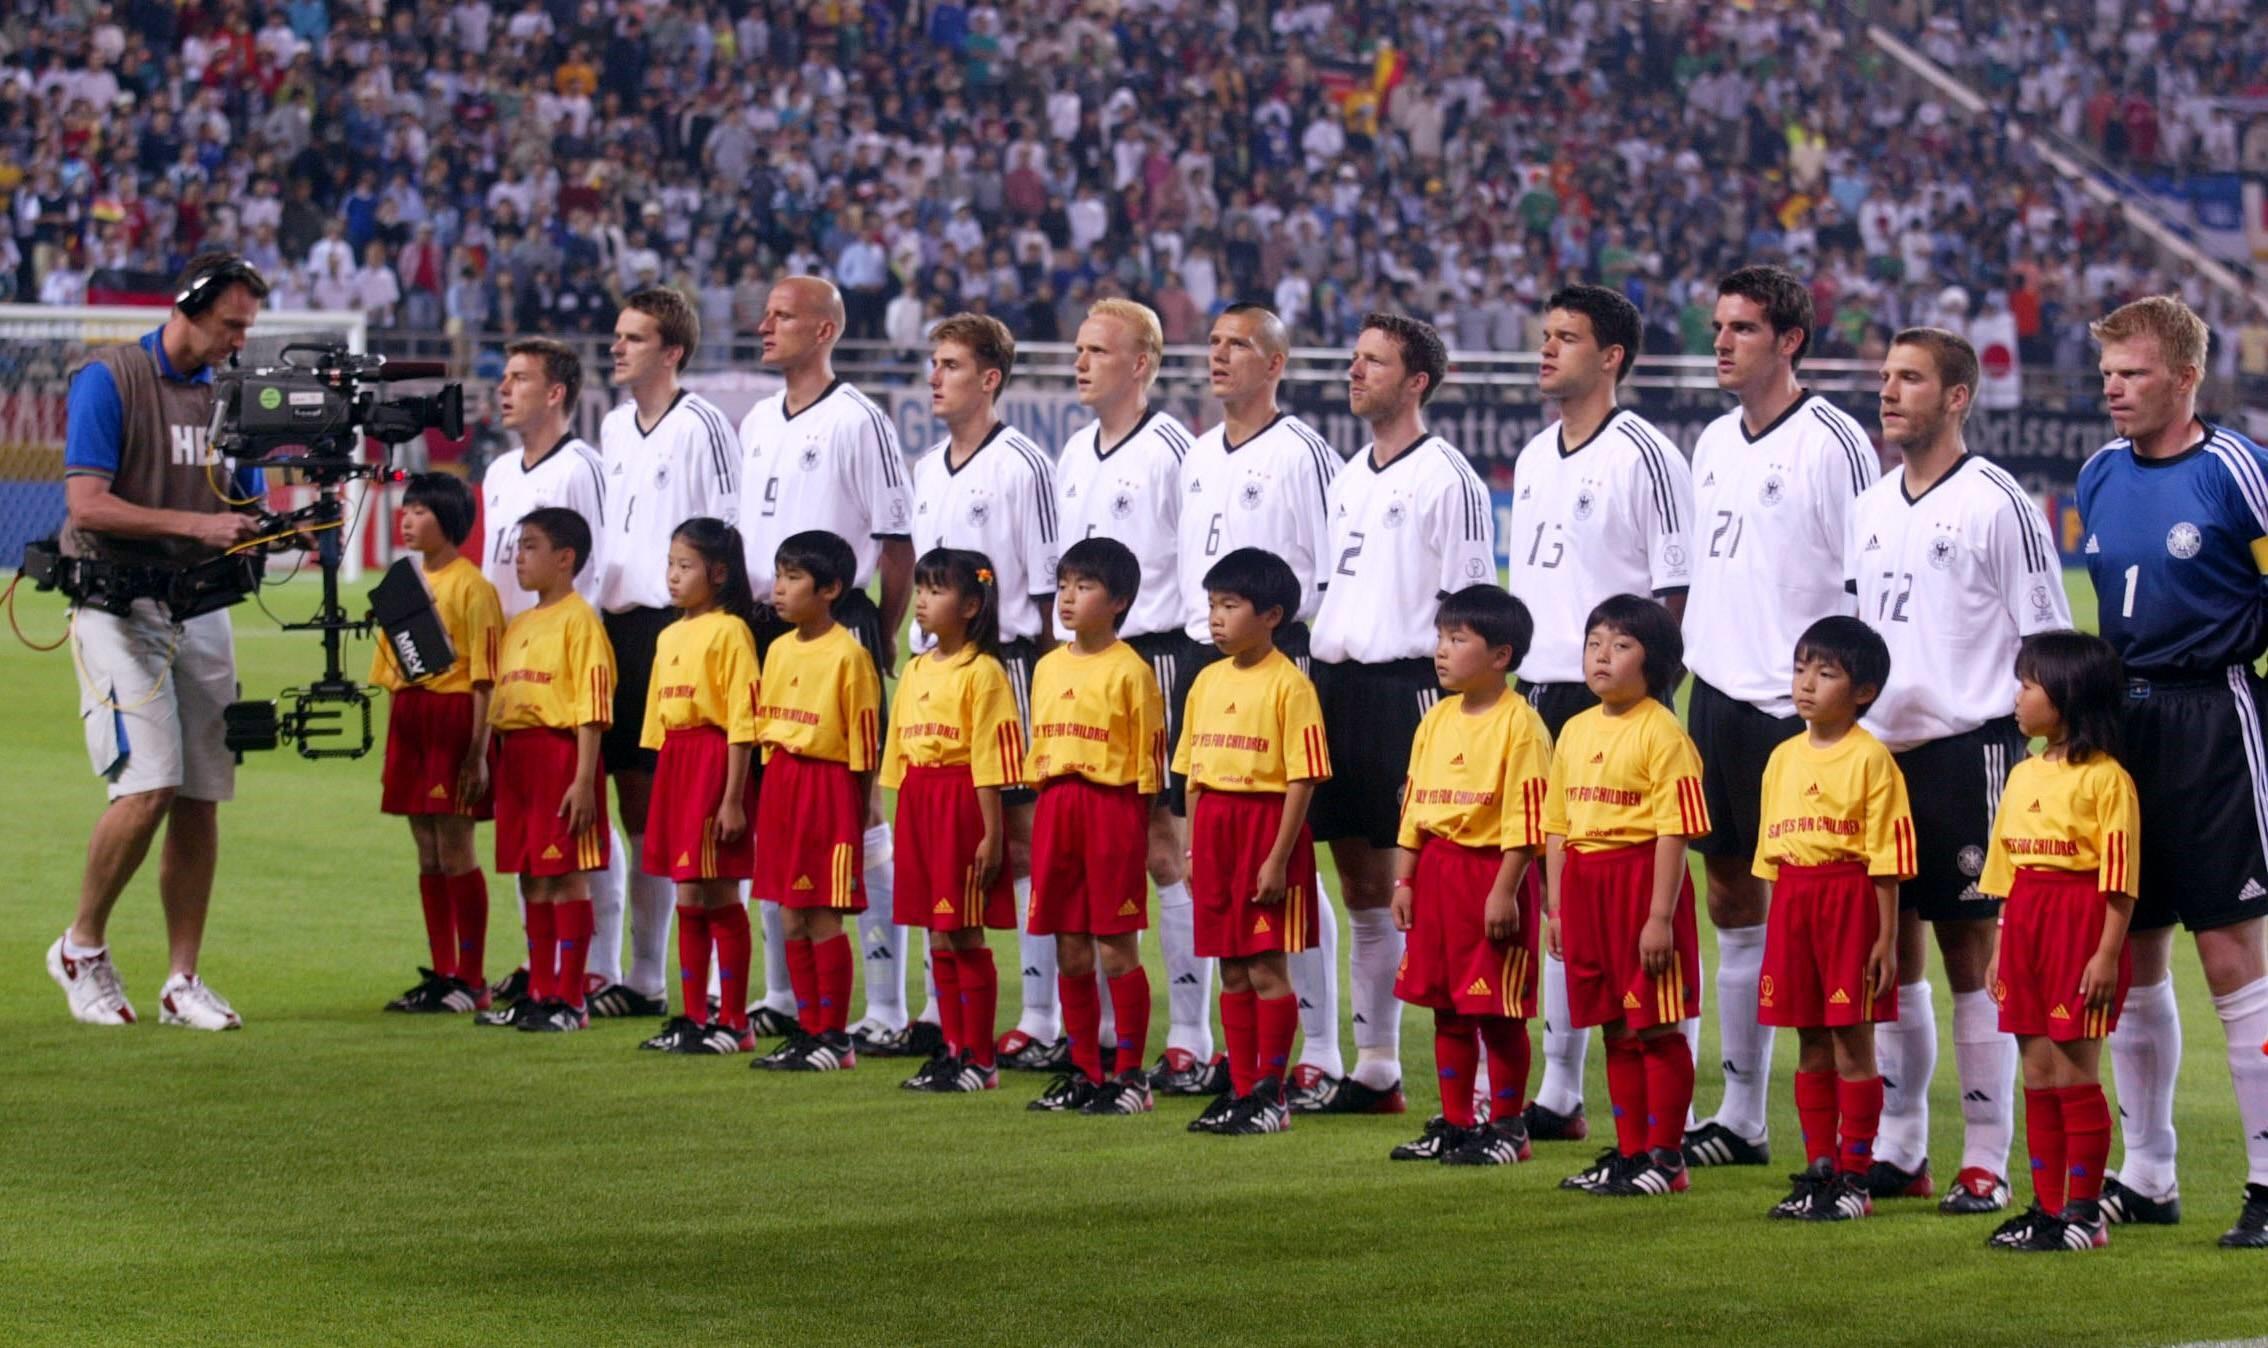 Germany 2002 (Klose, Kahn, Ballack)